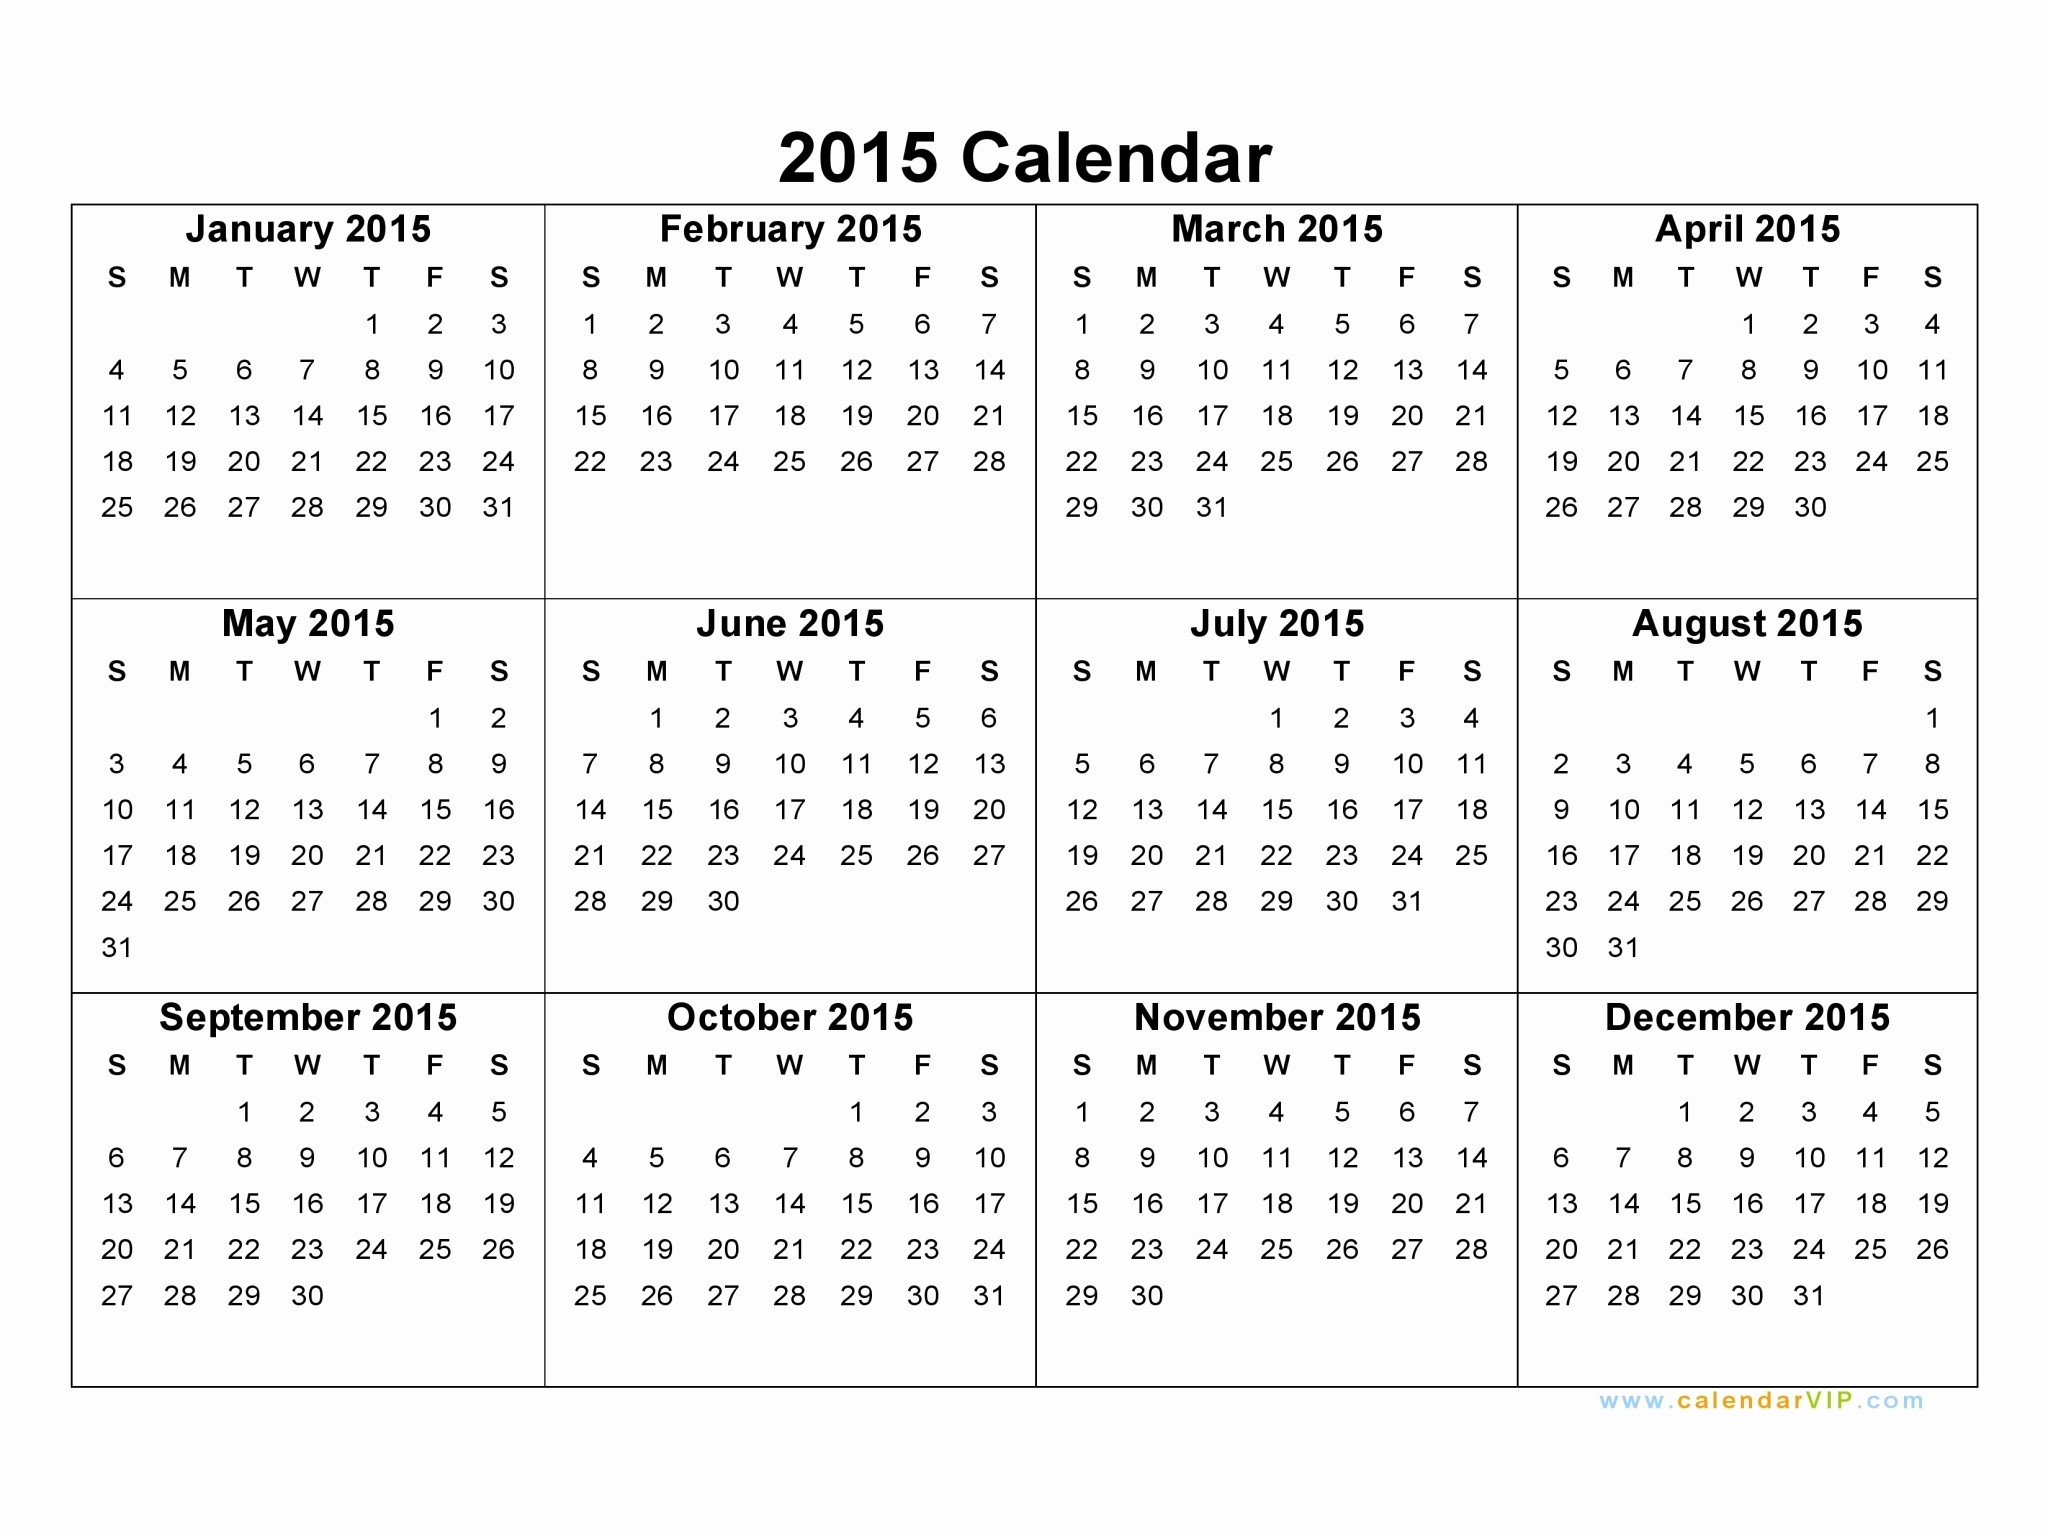 Free 2015 Yearly Calendar Template Luxury 2015 Calendar Template Beepmunk